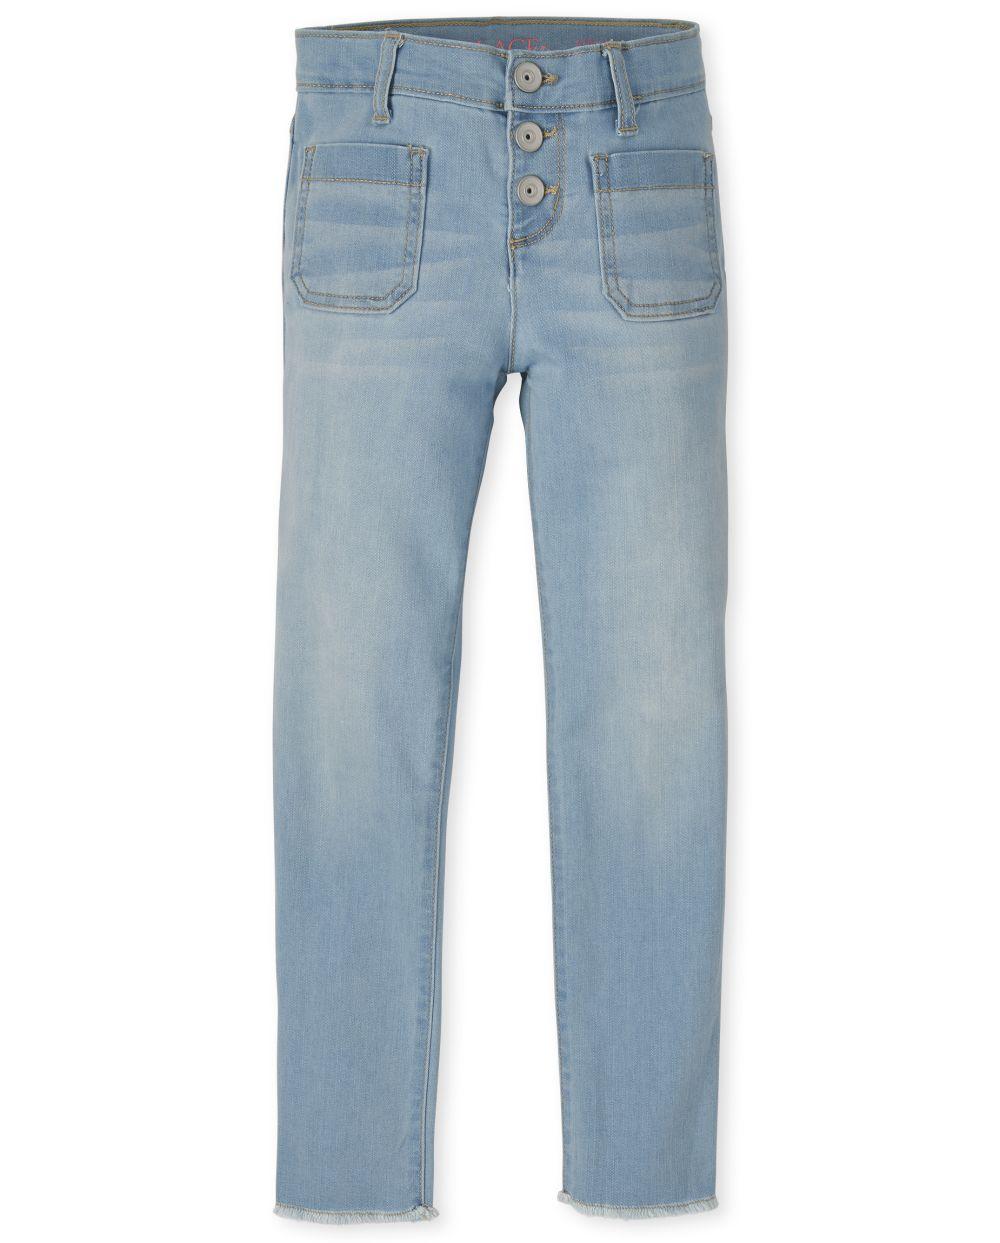 Girls Braided Straight Jeans